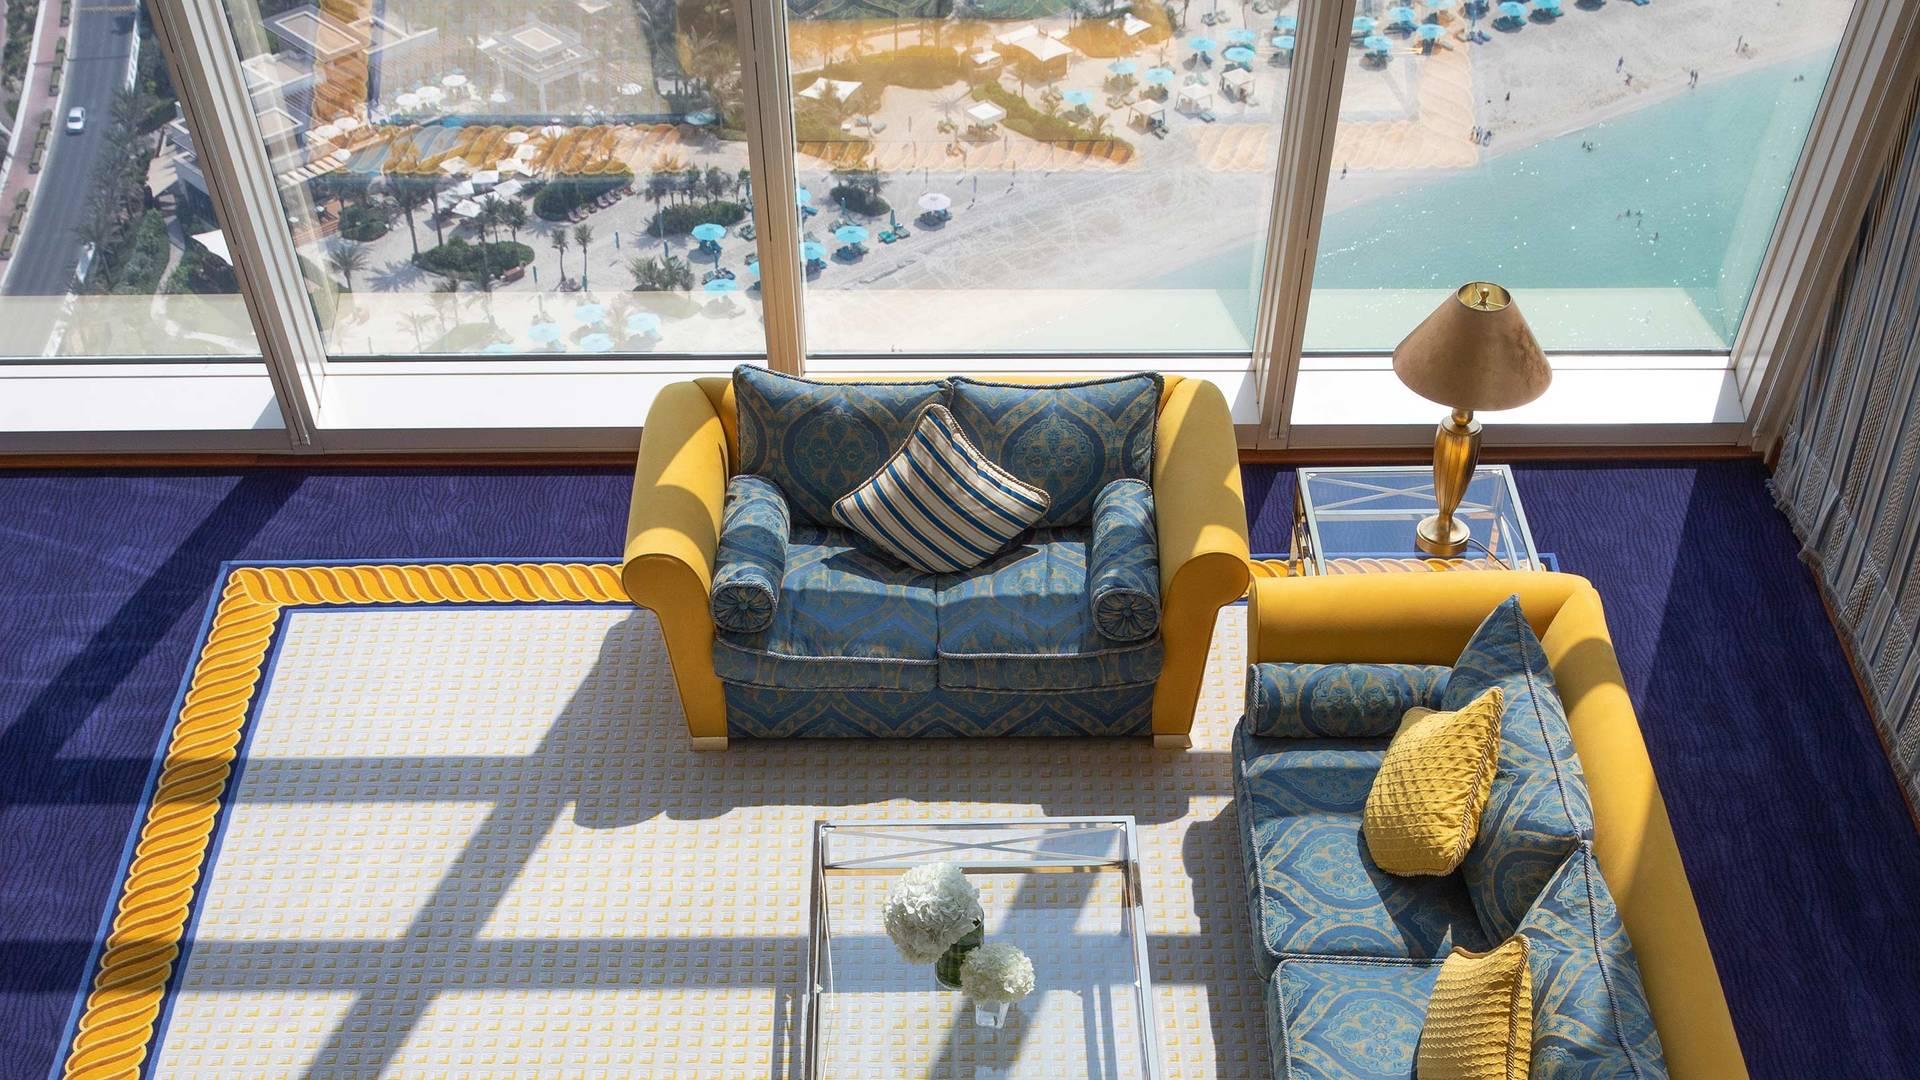 Jumeirah Burj Al Arab Club suite livingroom top view_16-9